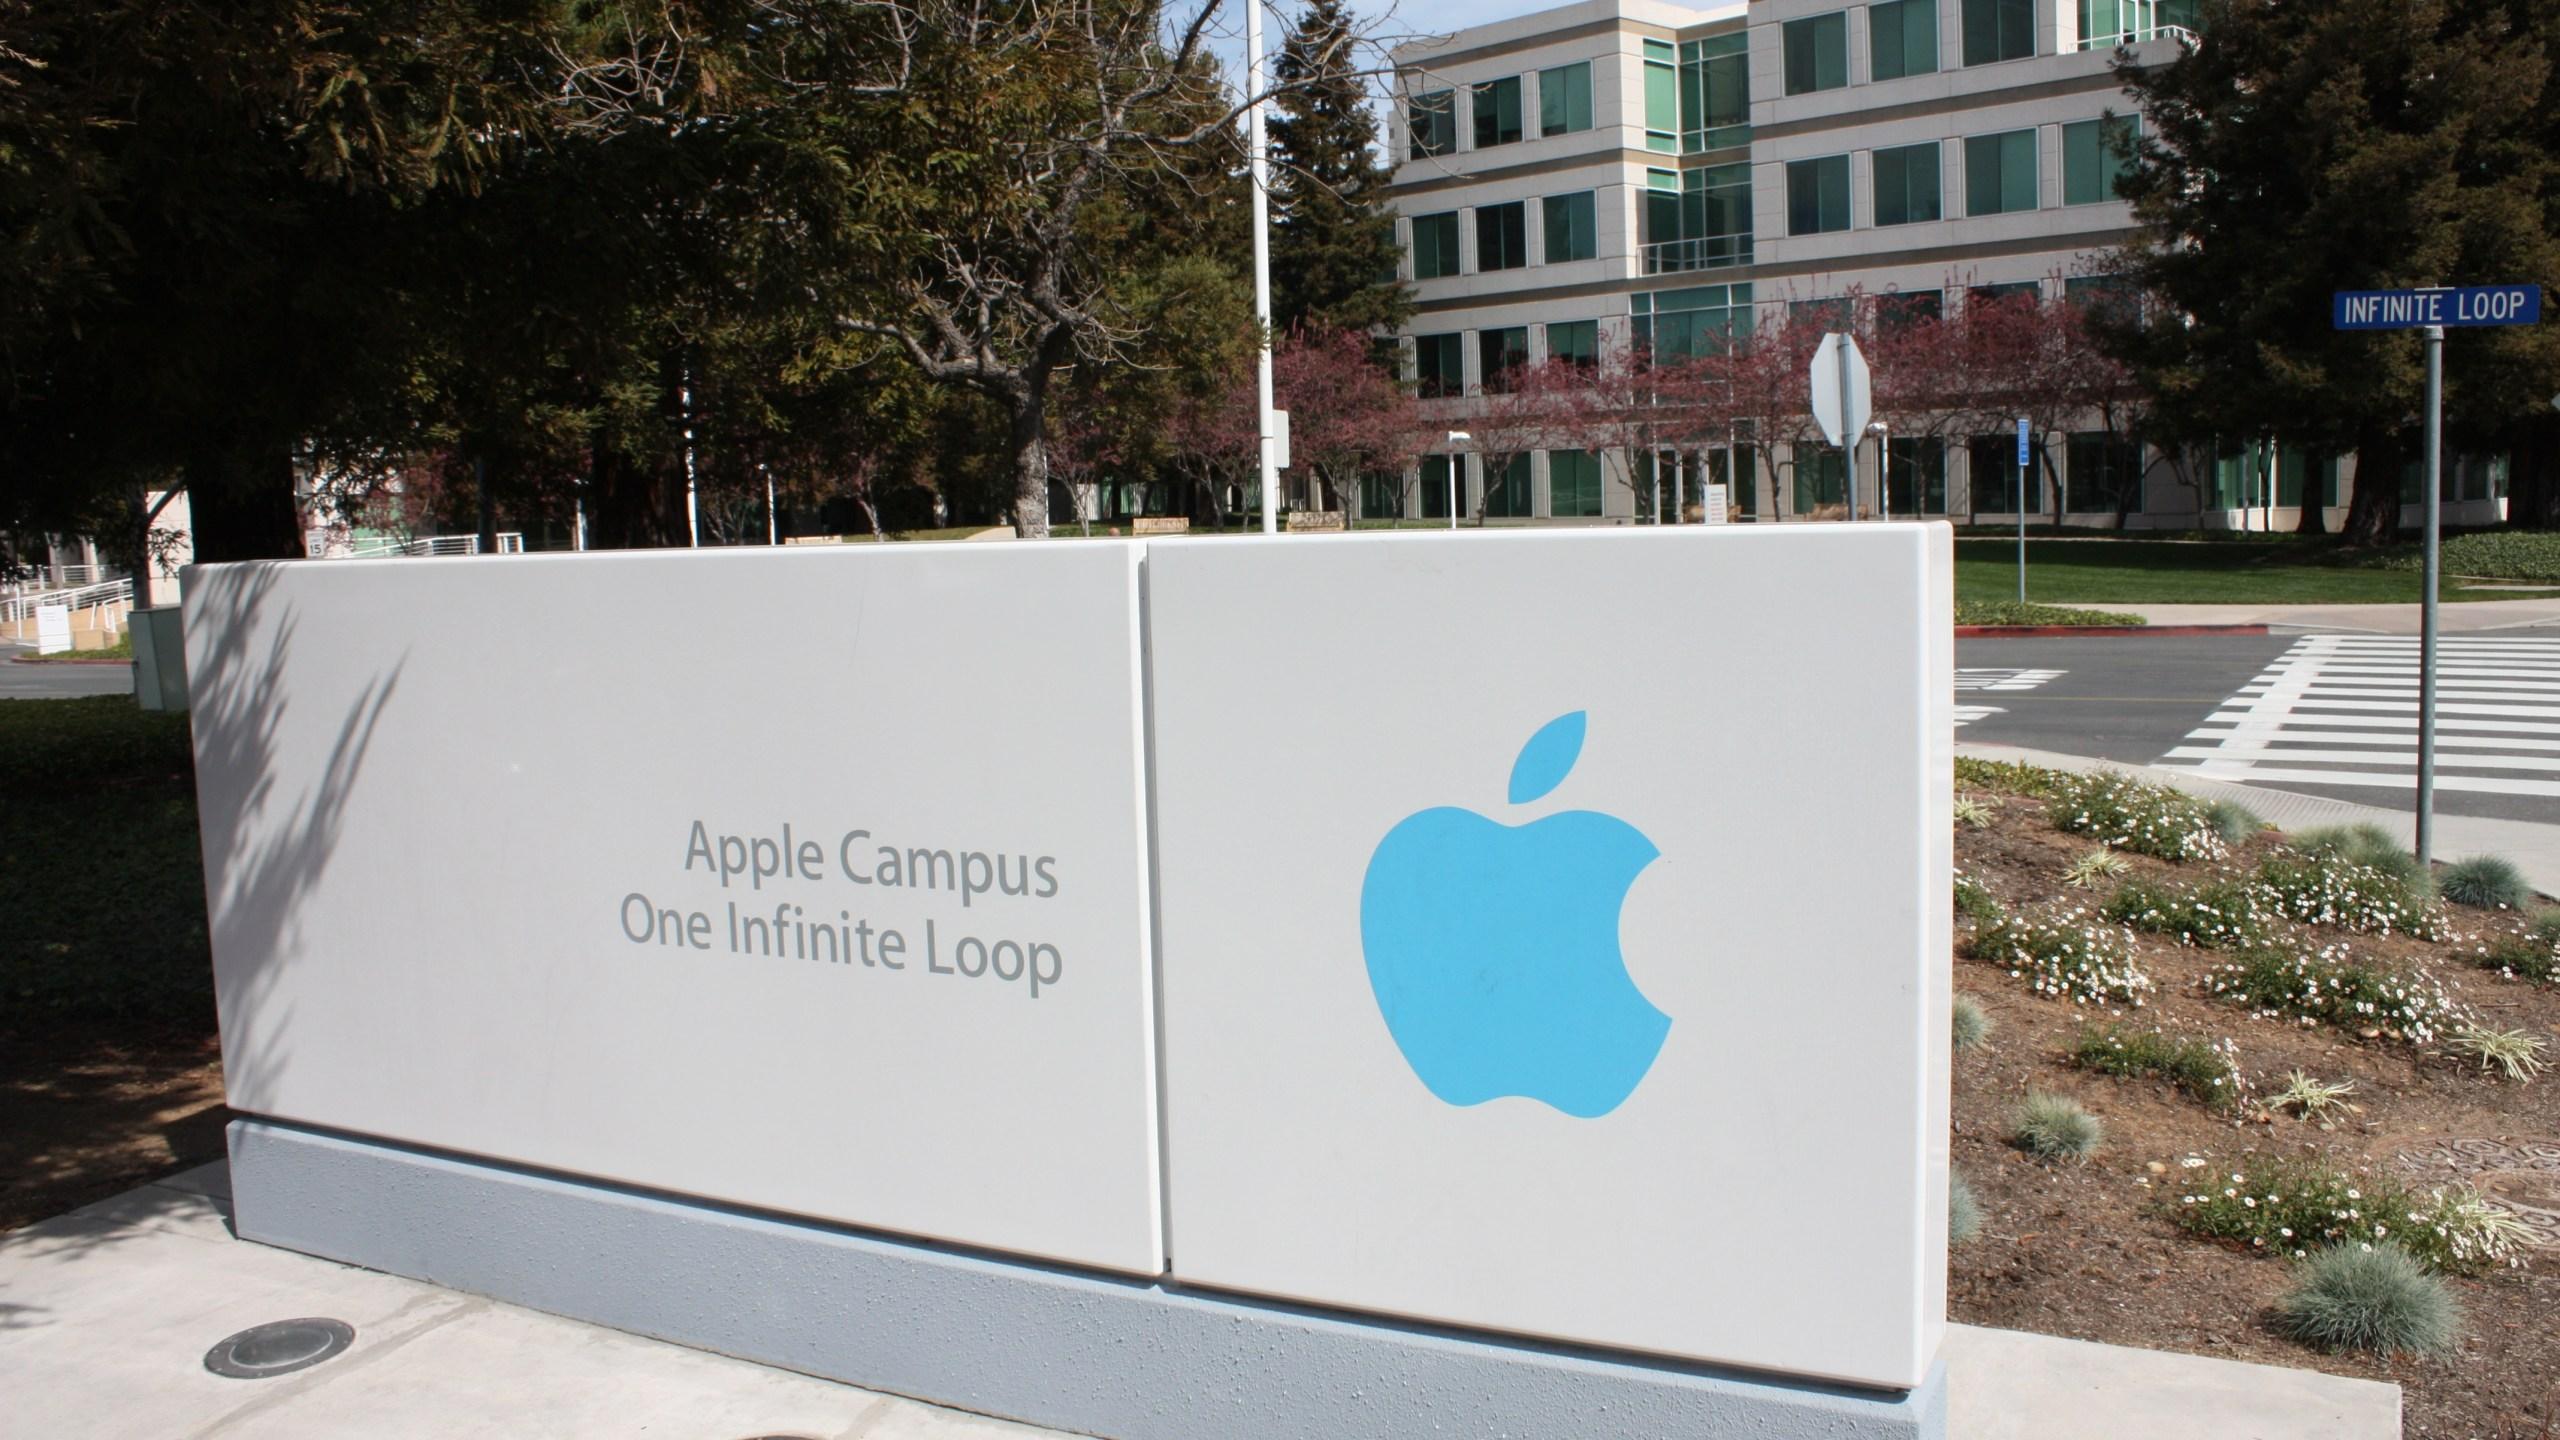 The Apple headquarters at 1 Infinite Loop, Cupertino, California. (Photo: CNN)